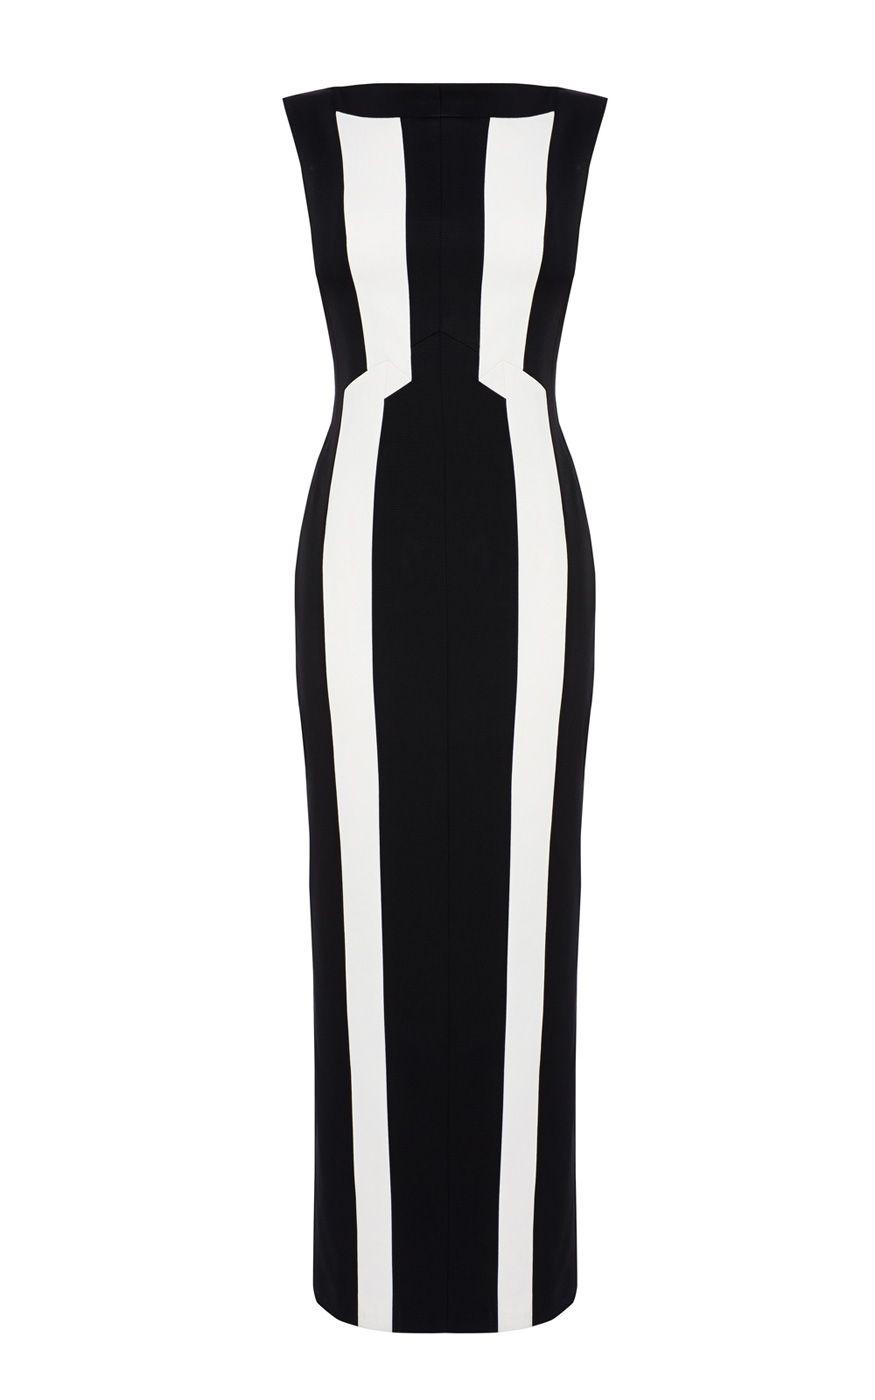 Vertical Stripe Maxi Dress Guys And Girls London Fashion Retailer Maxi Dress Dresses Vertical Striped Dress [ 1400 x 875 Pixel ]